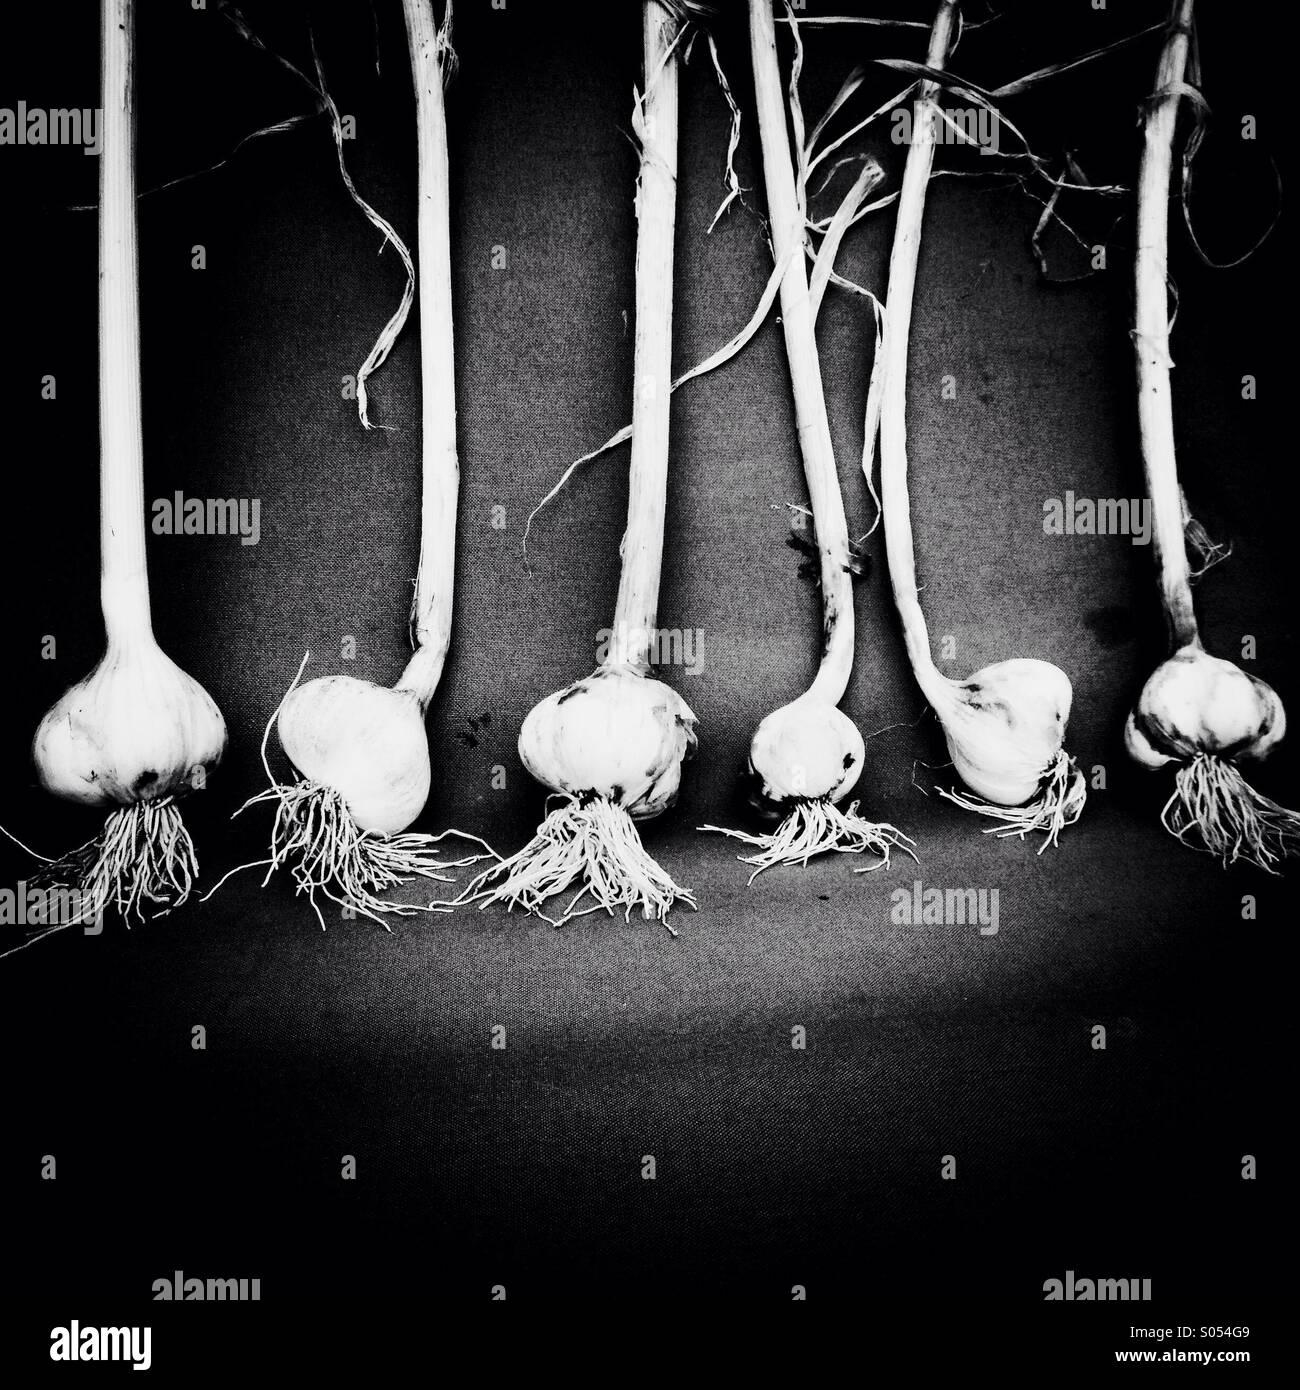 Harvested garlic - Stock Image